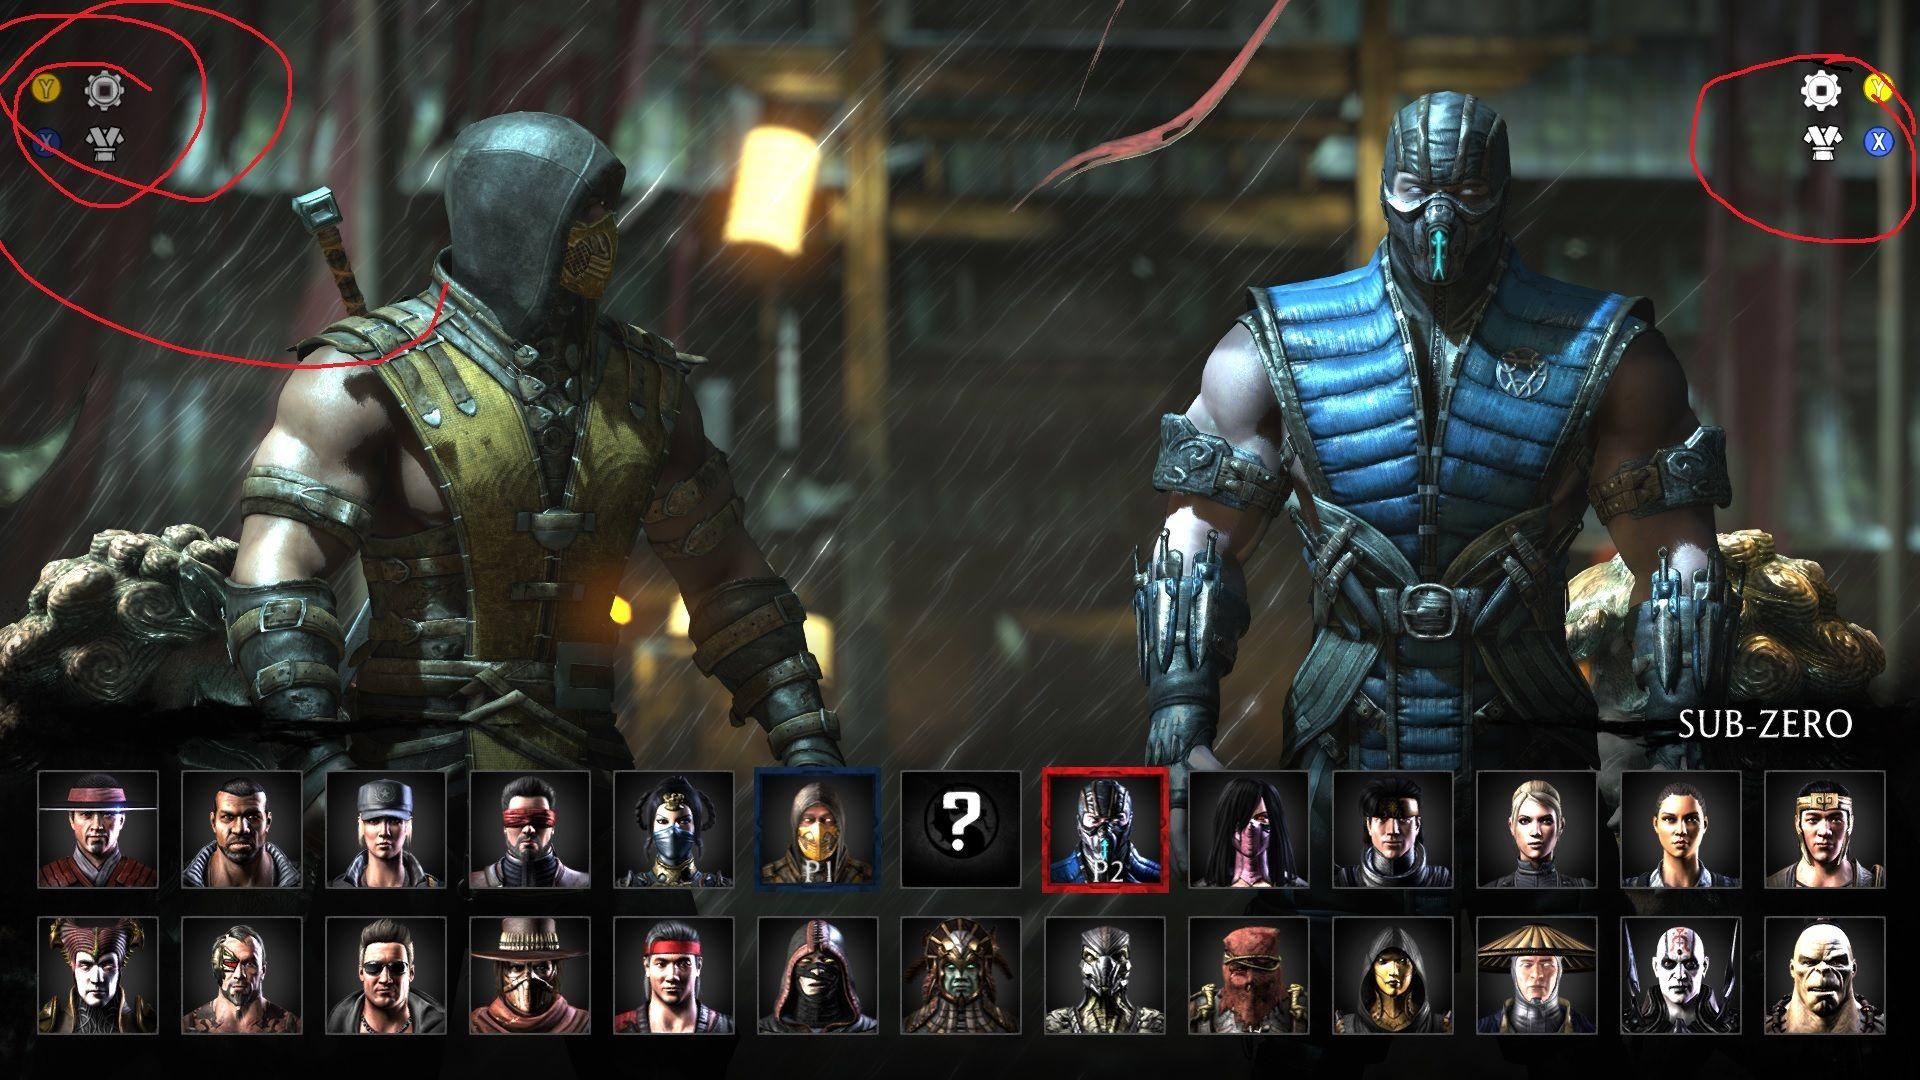 74300858fc7f5b8a2367336c33ec5e90 - How To Get All Characters In Mortal Kombat Xl